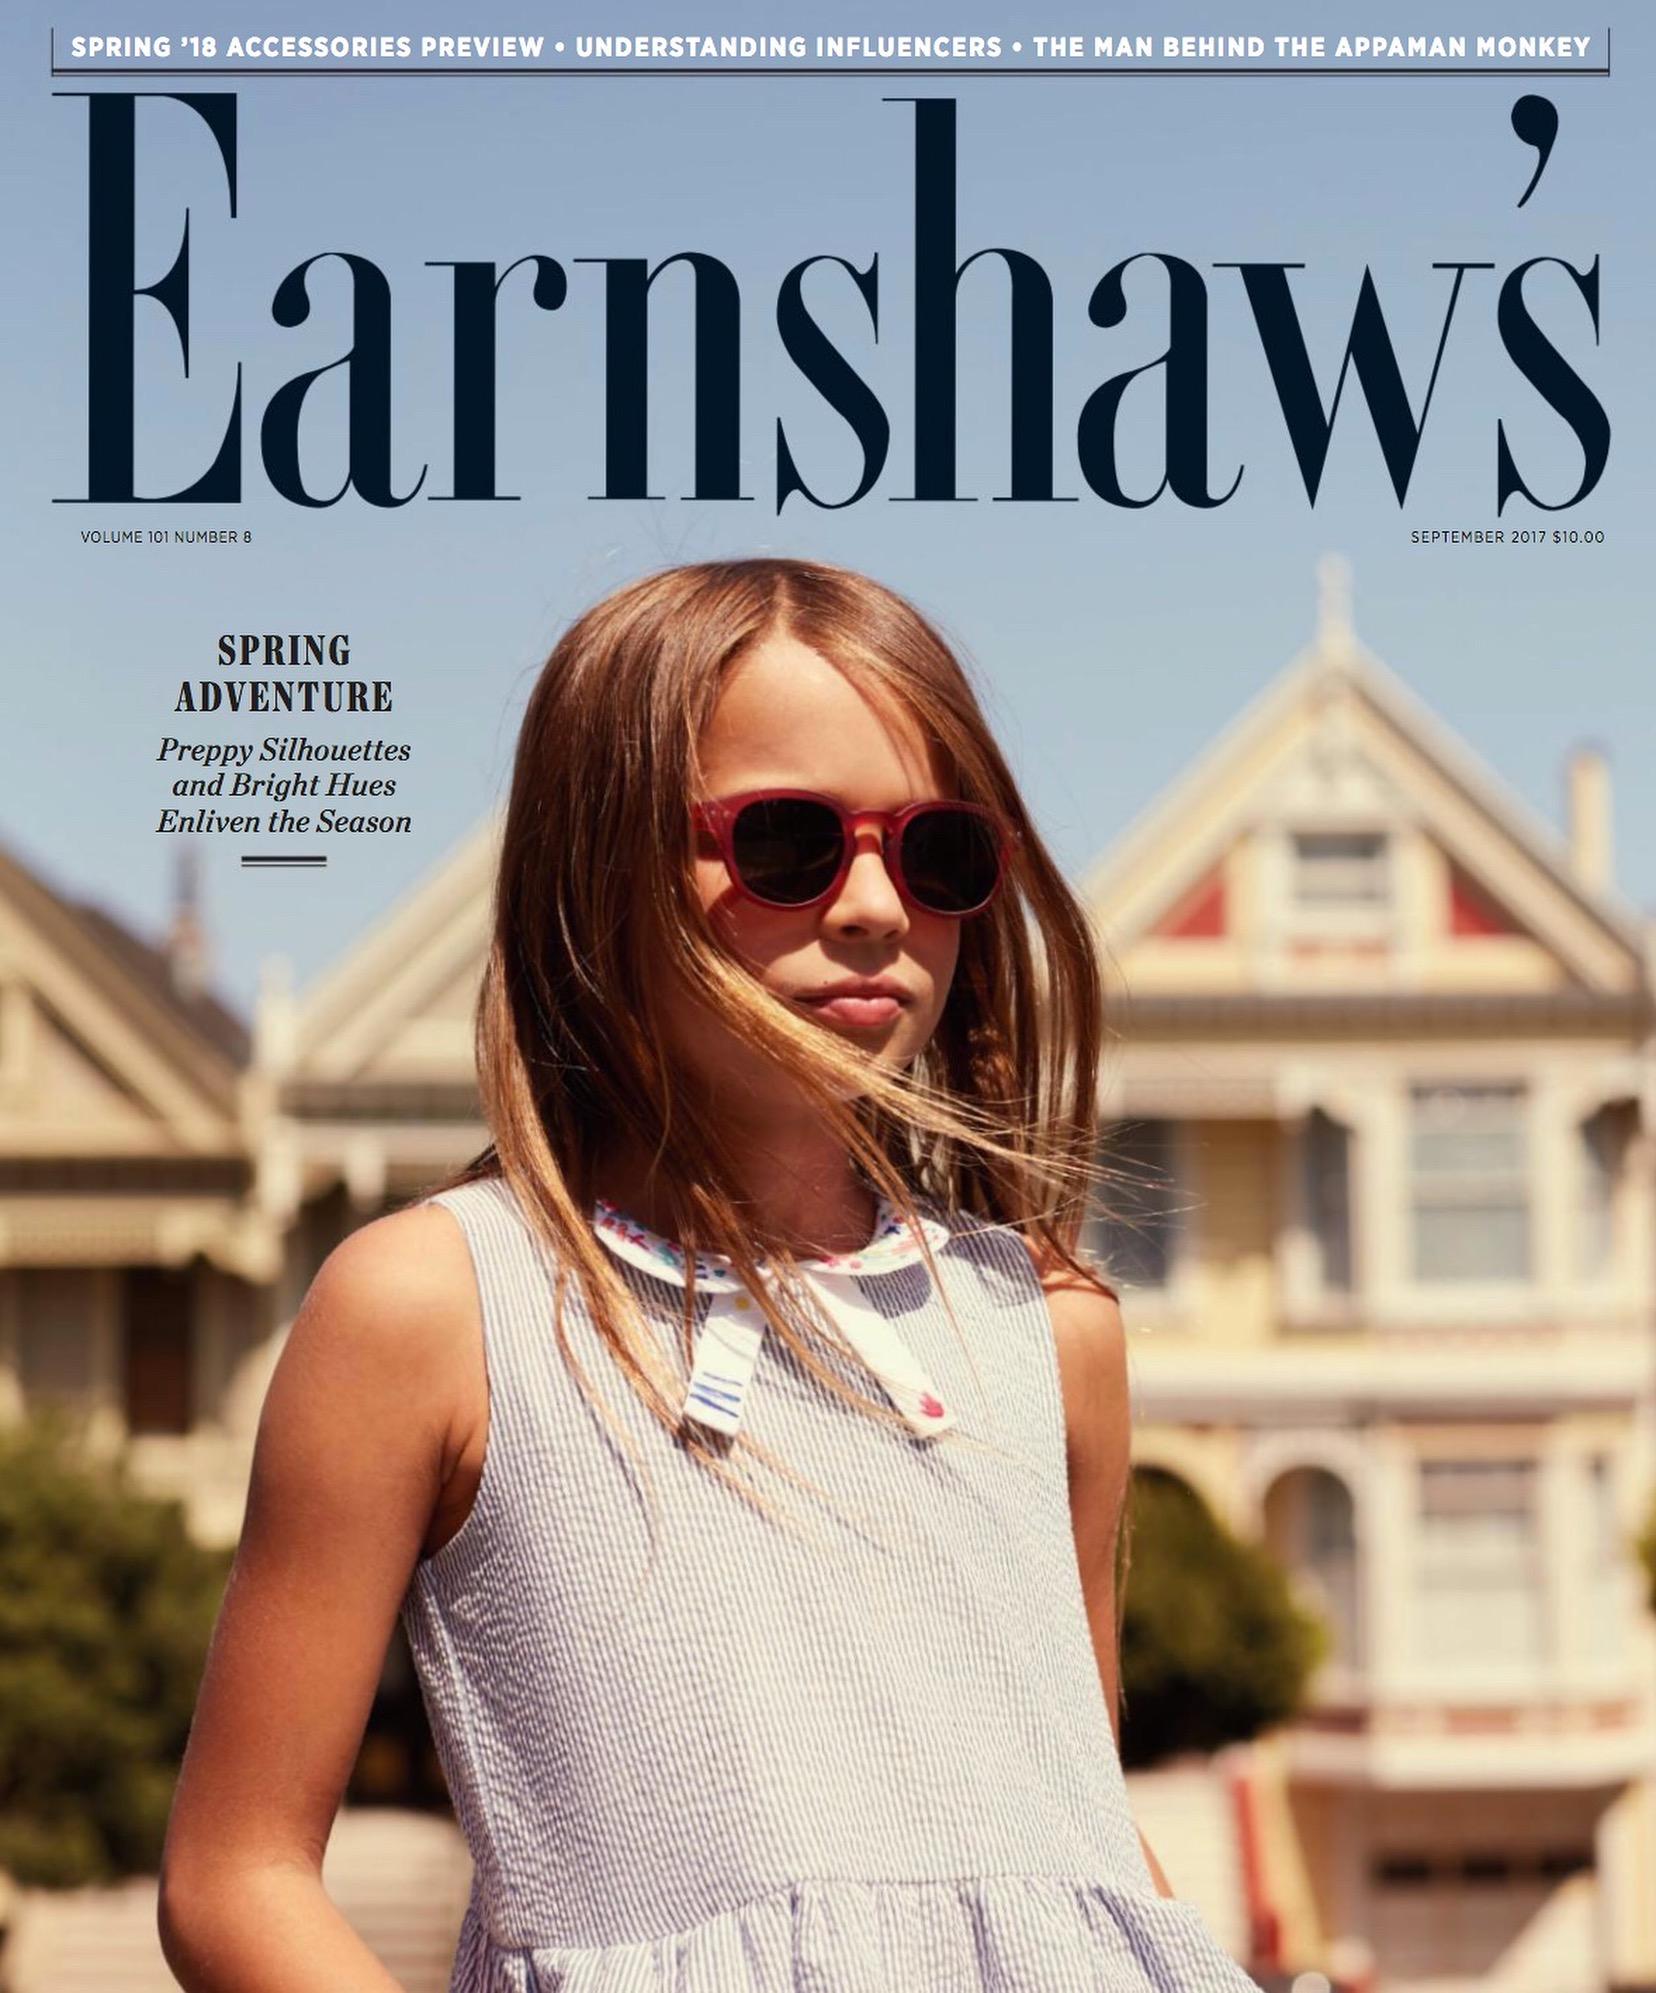 Priscilla Gragg, Earnshaws Magazine